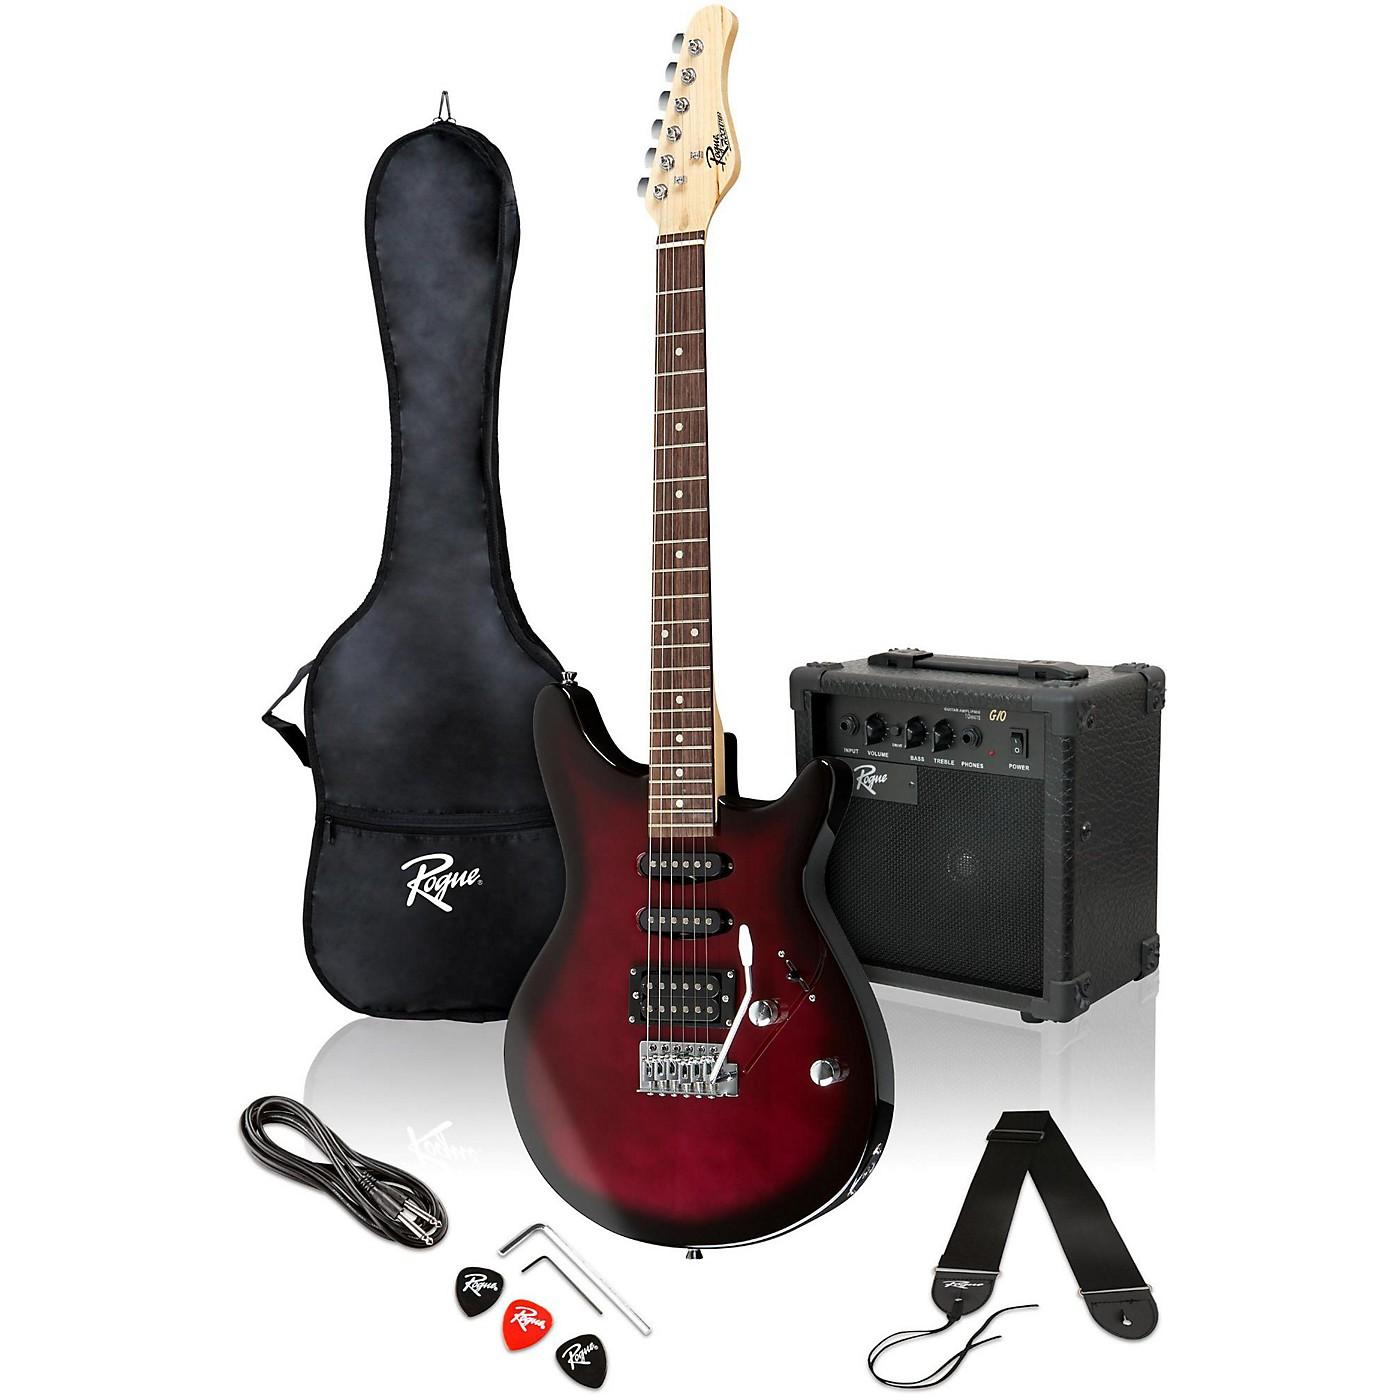 Rogue Rocketeer Electric Guitar Pack thumbnail